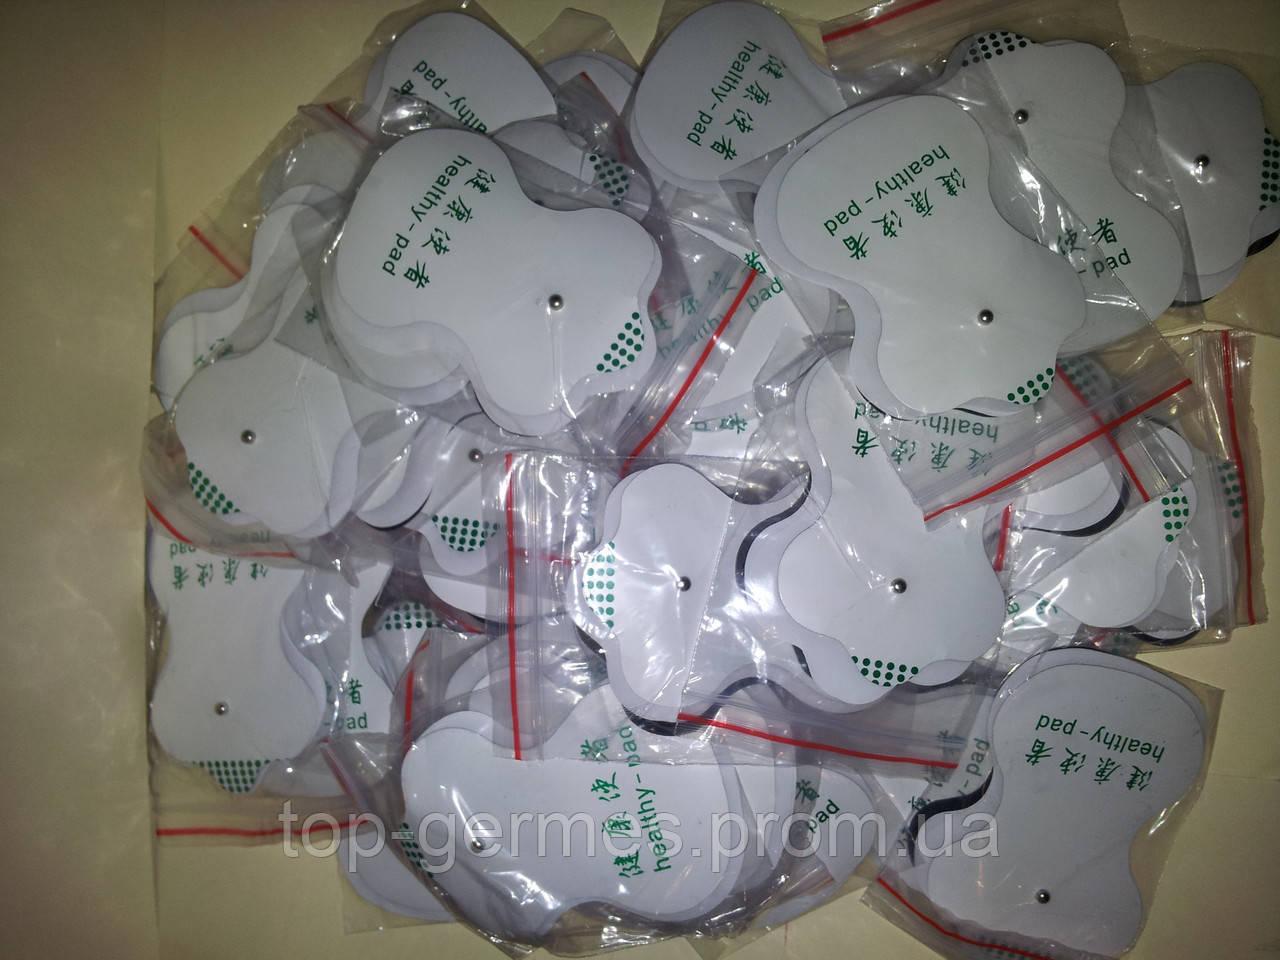 Электроды миостимуляторов